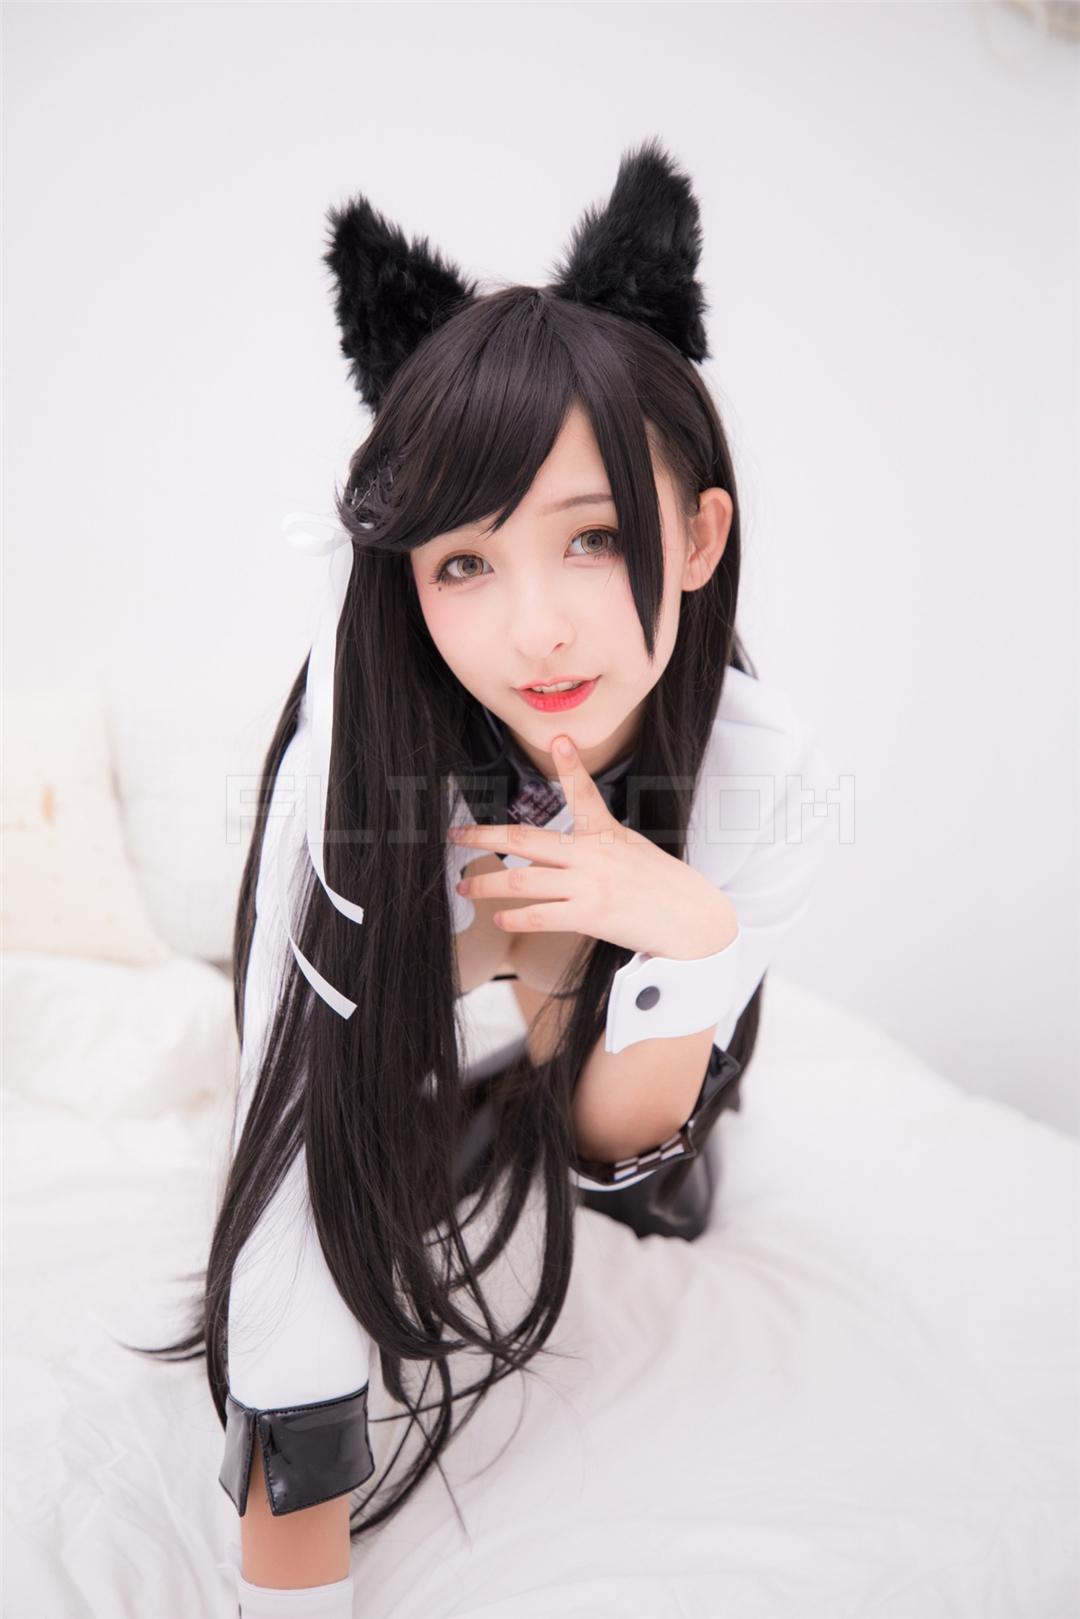 【福利姬】神楽坂真冬 LATEX VER-Azurlane ATAGO 【150P】